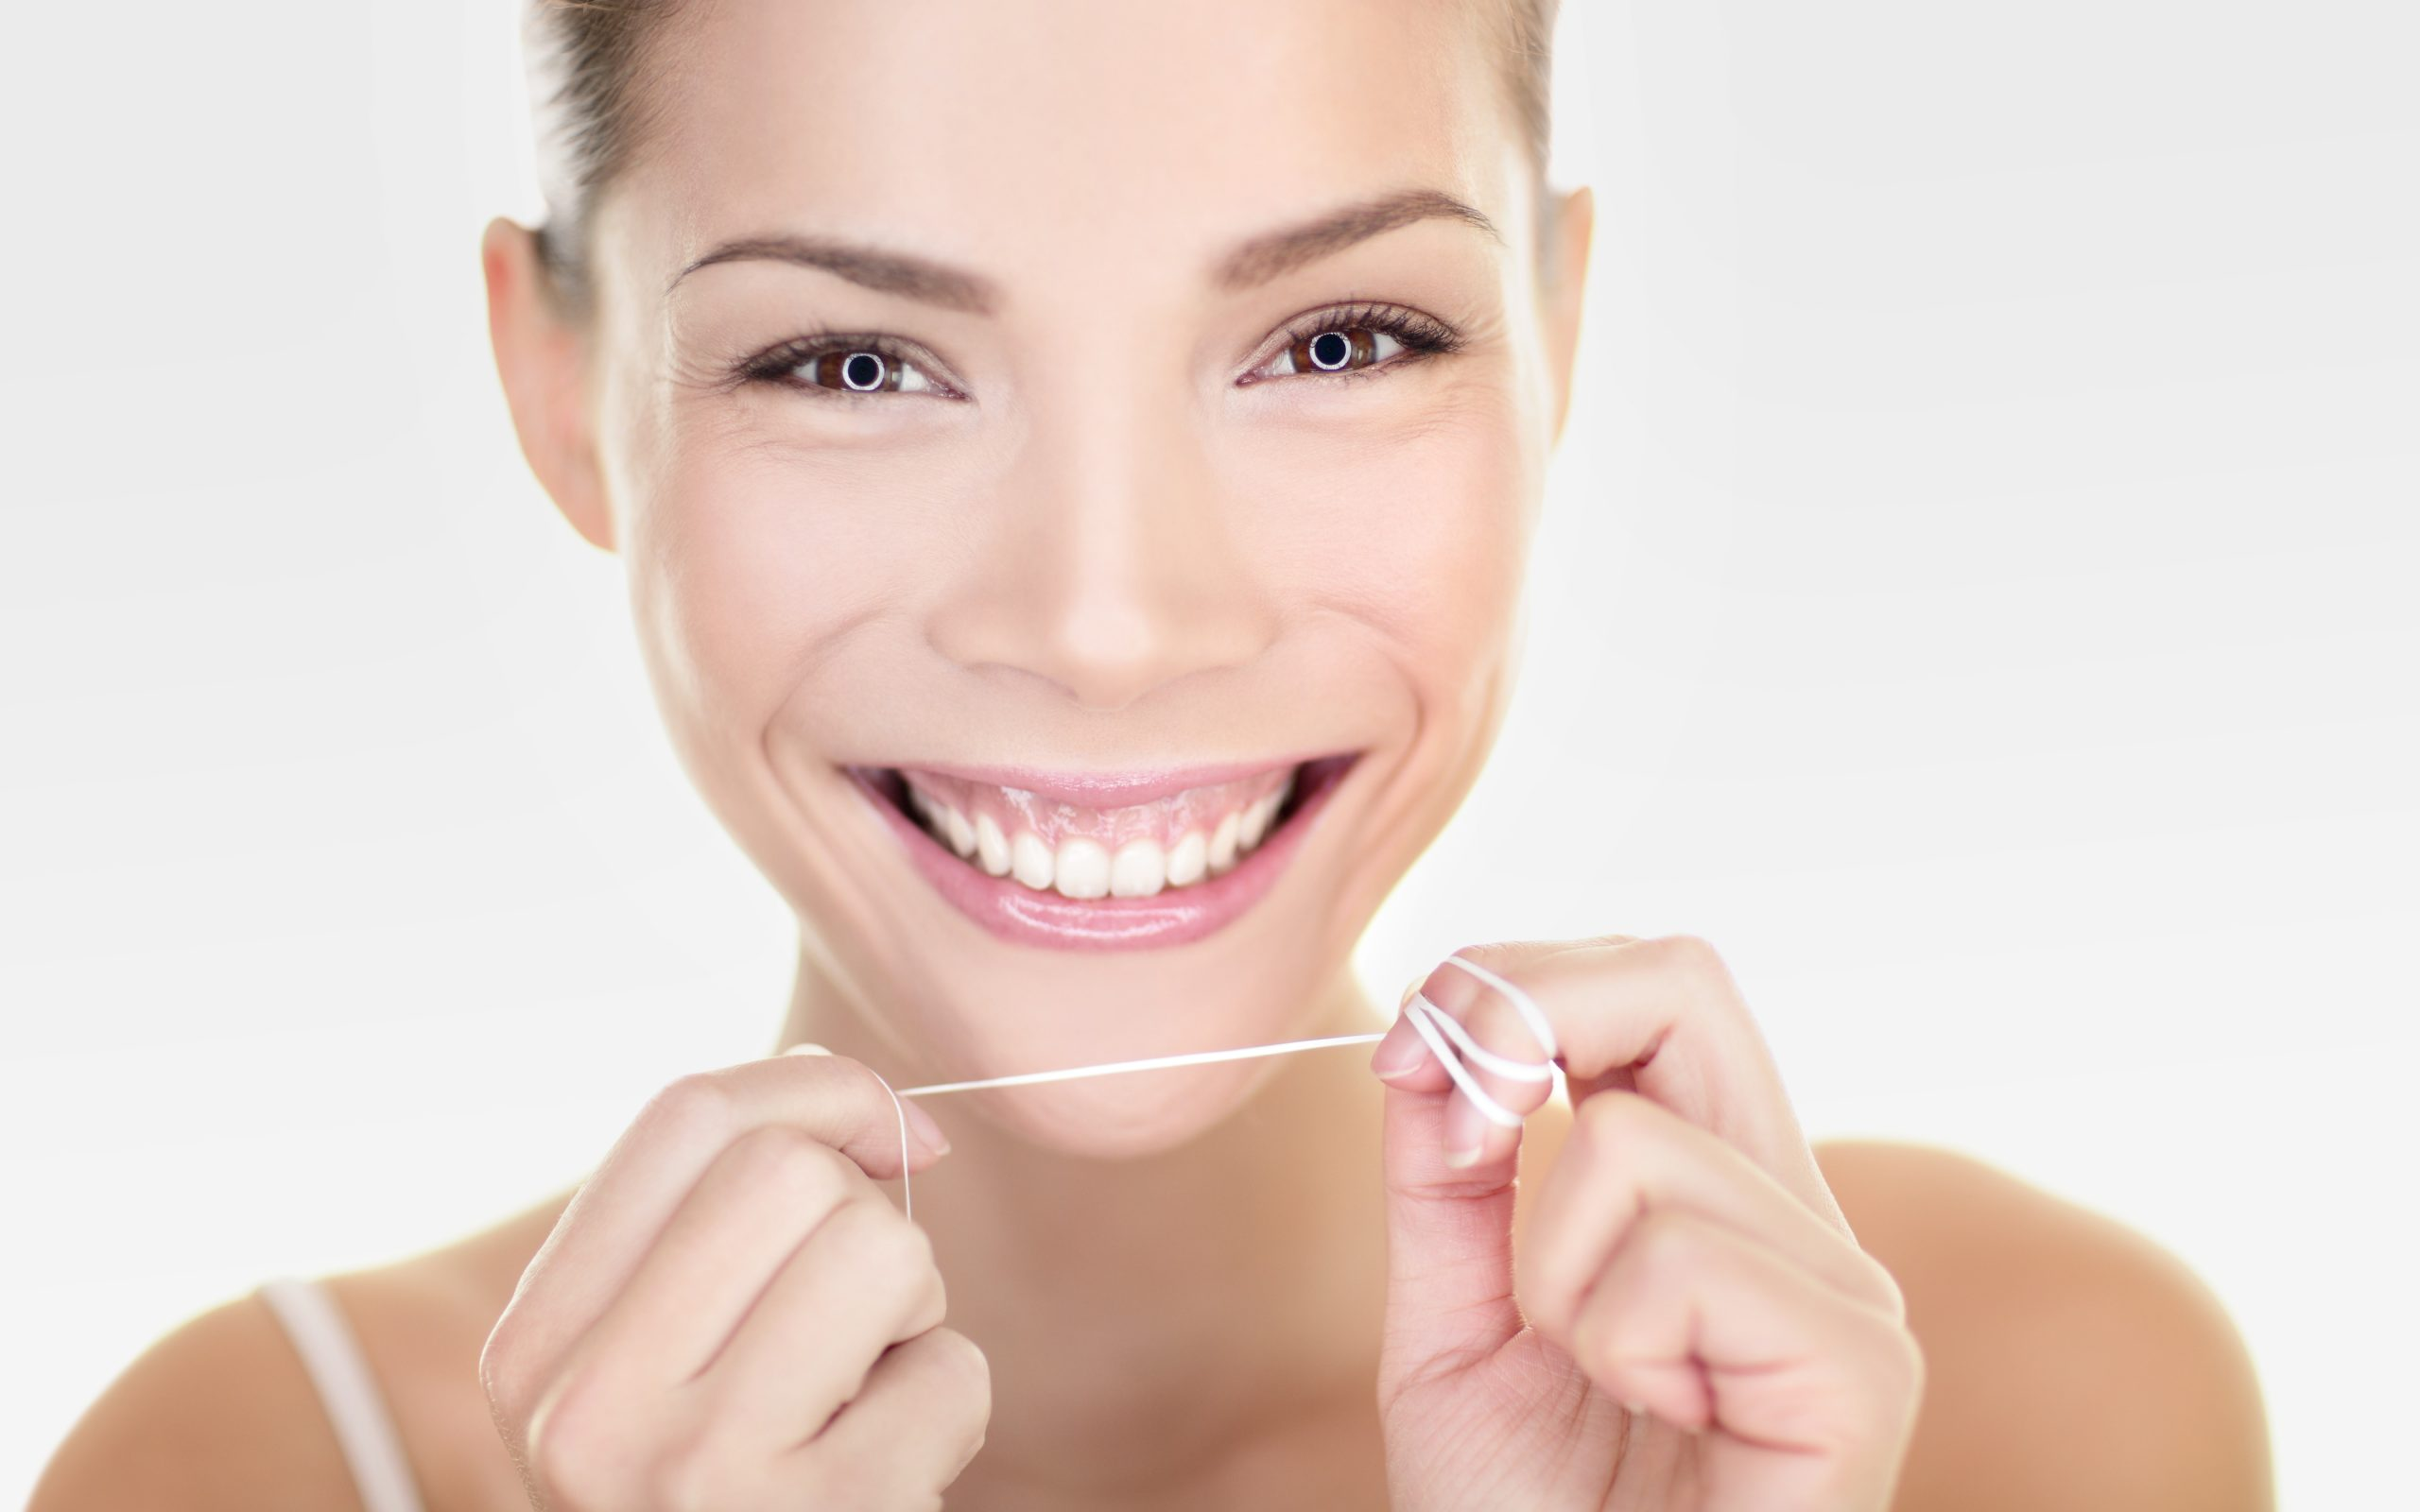 MW Dental: Messestand-Konzept von Bosbach, Key Visual